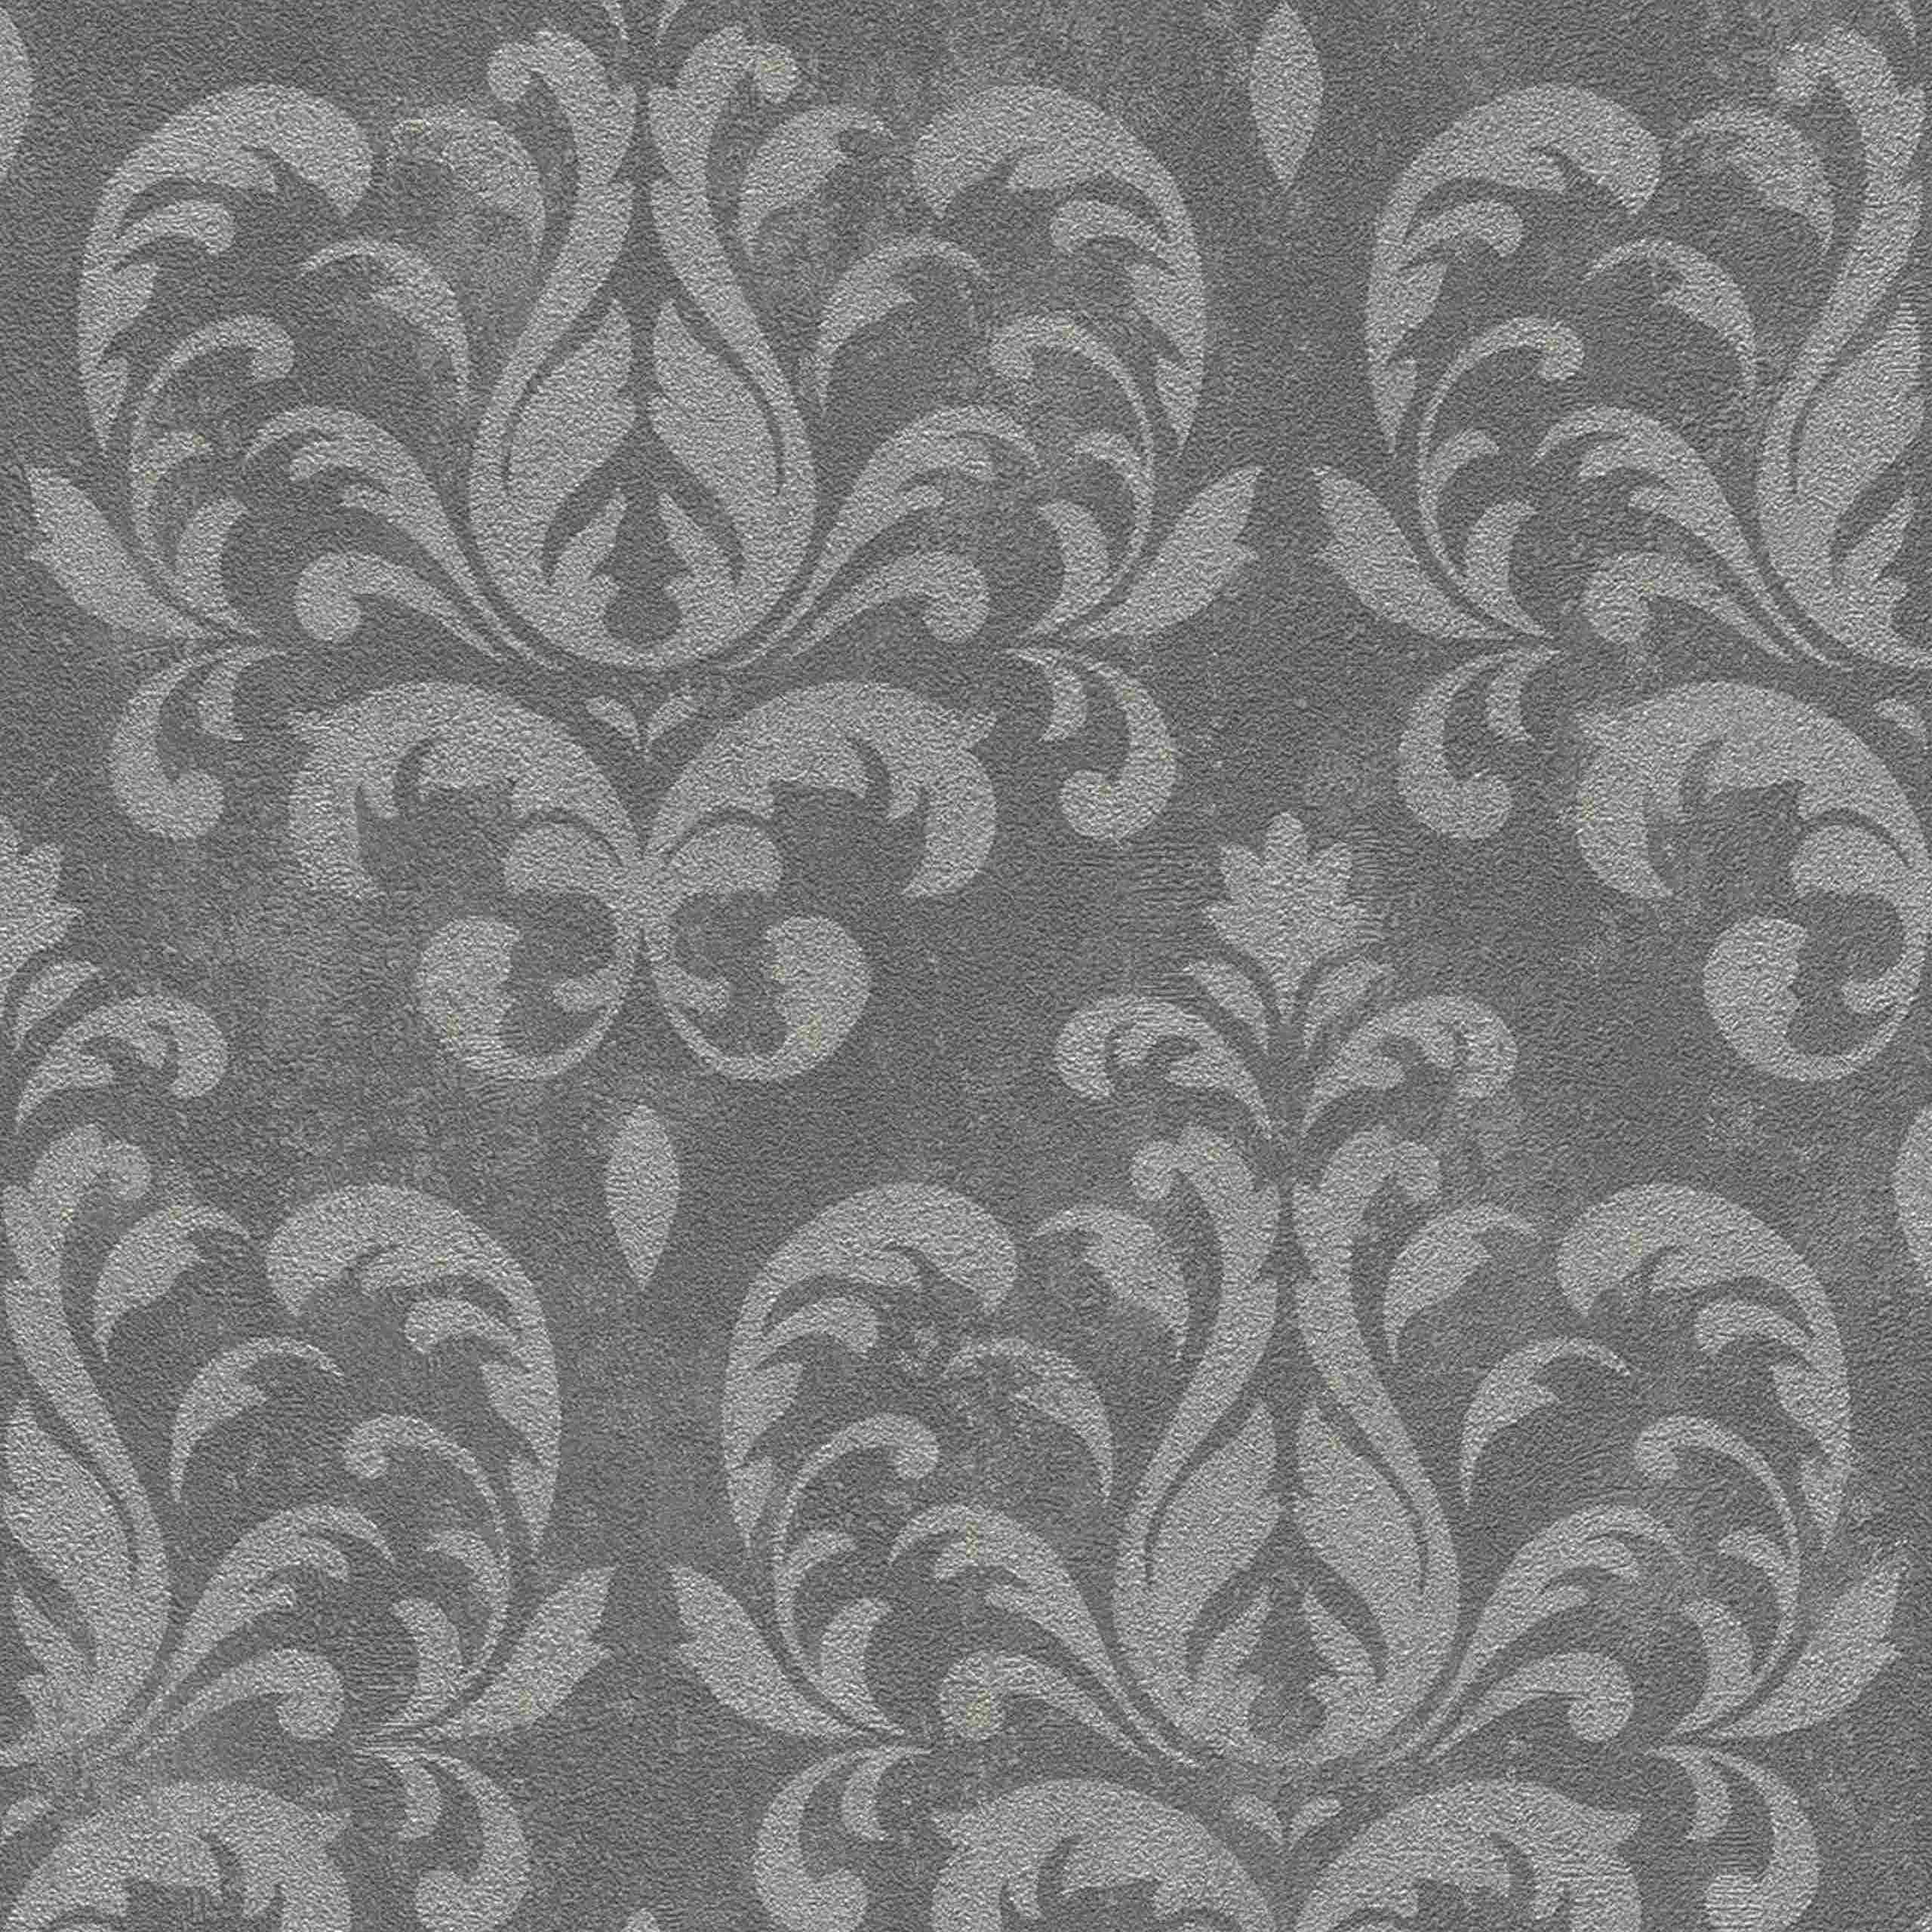 Rasch Vlies-Tapete Kollektion 'Lucera' 608540 Vintage Barock-Dekor